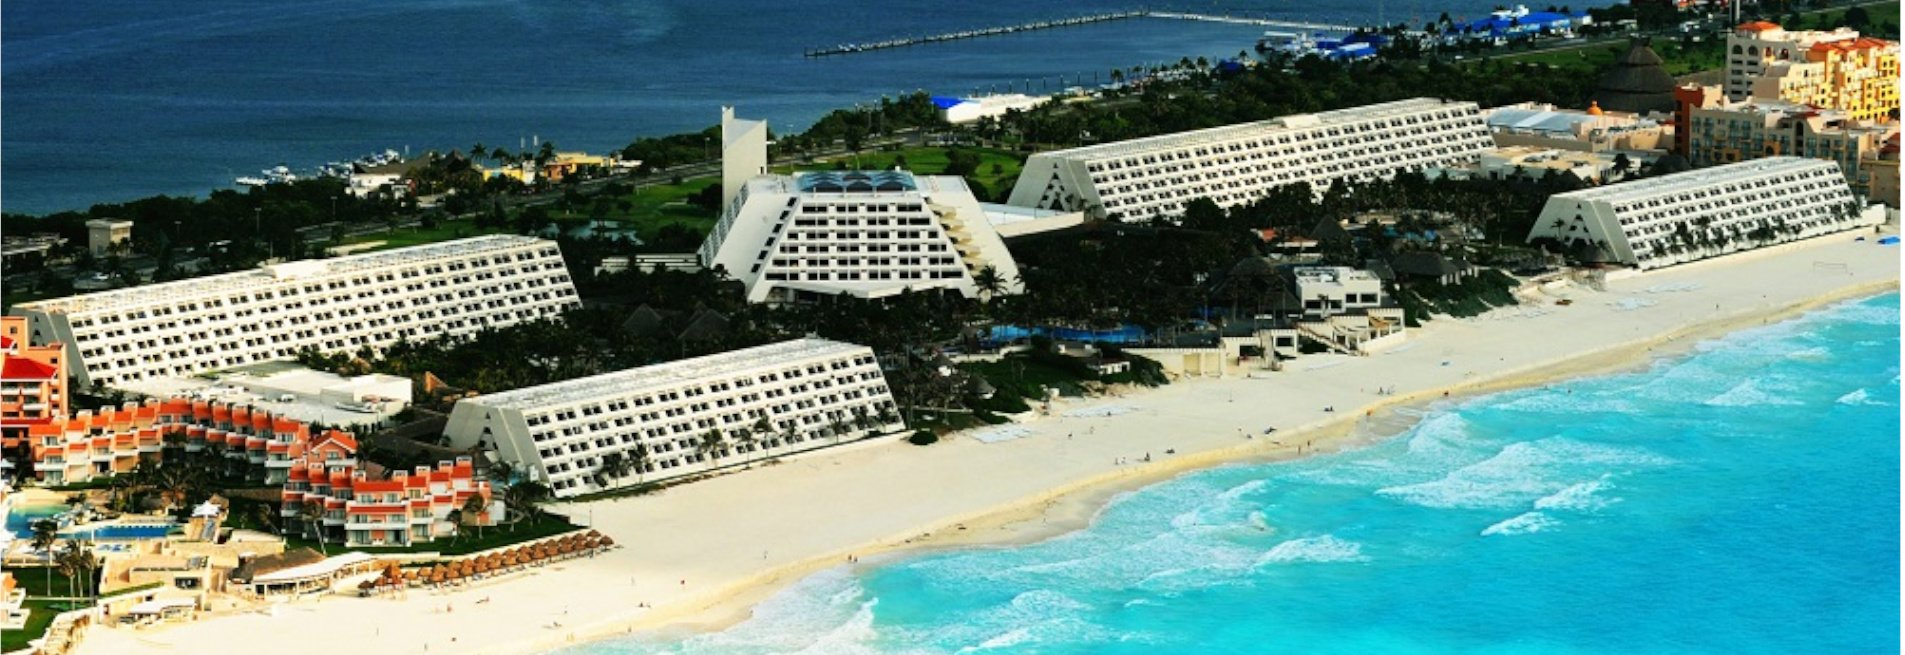 Grand Oasis Cancun Spring Break 2020.Oasis Cancun Lite Spring Break 2020 Student Special